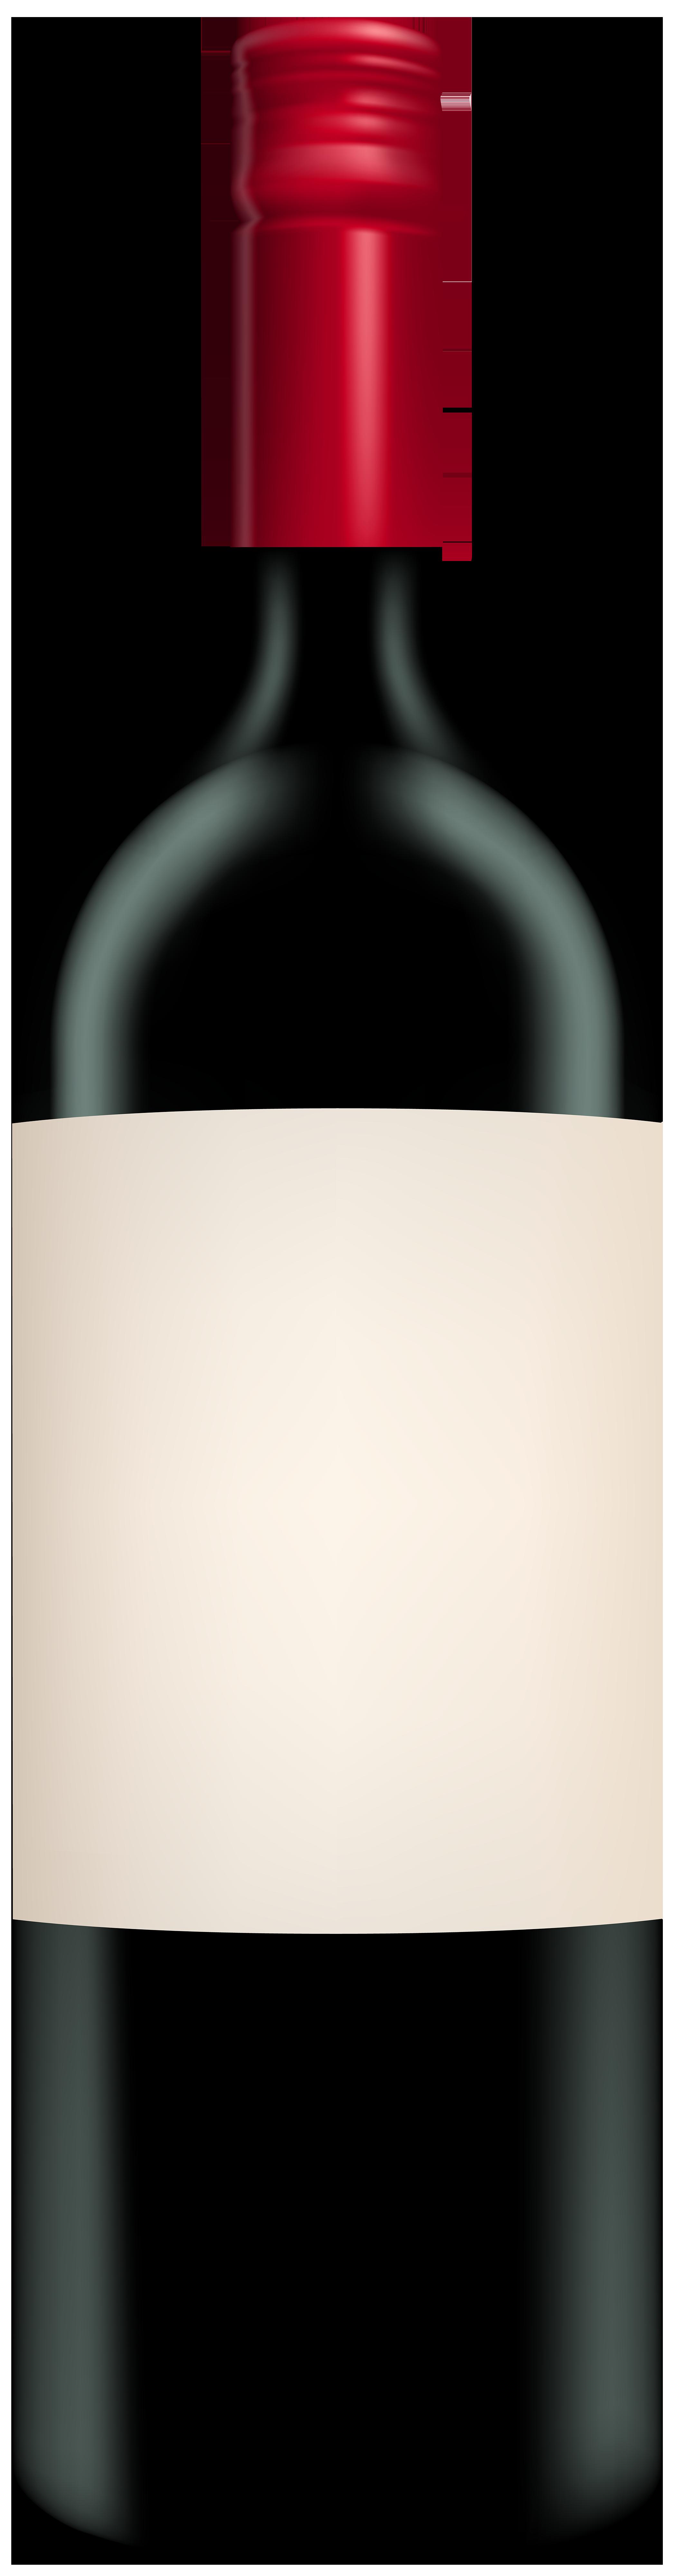 2103x8000 Bottle Of Red Wine Clip Art Imageu200b Gallery Yopriceville